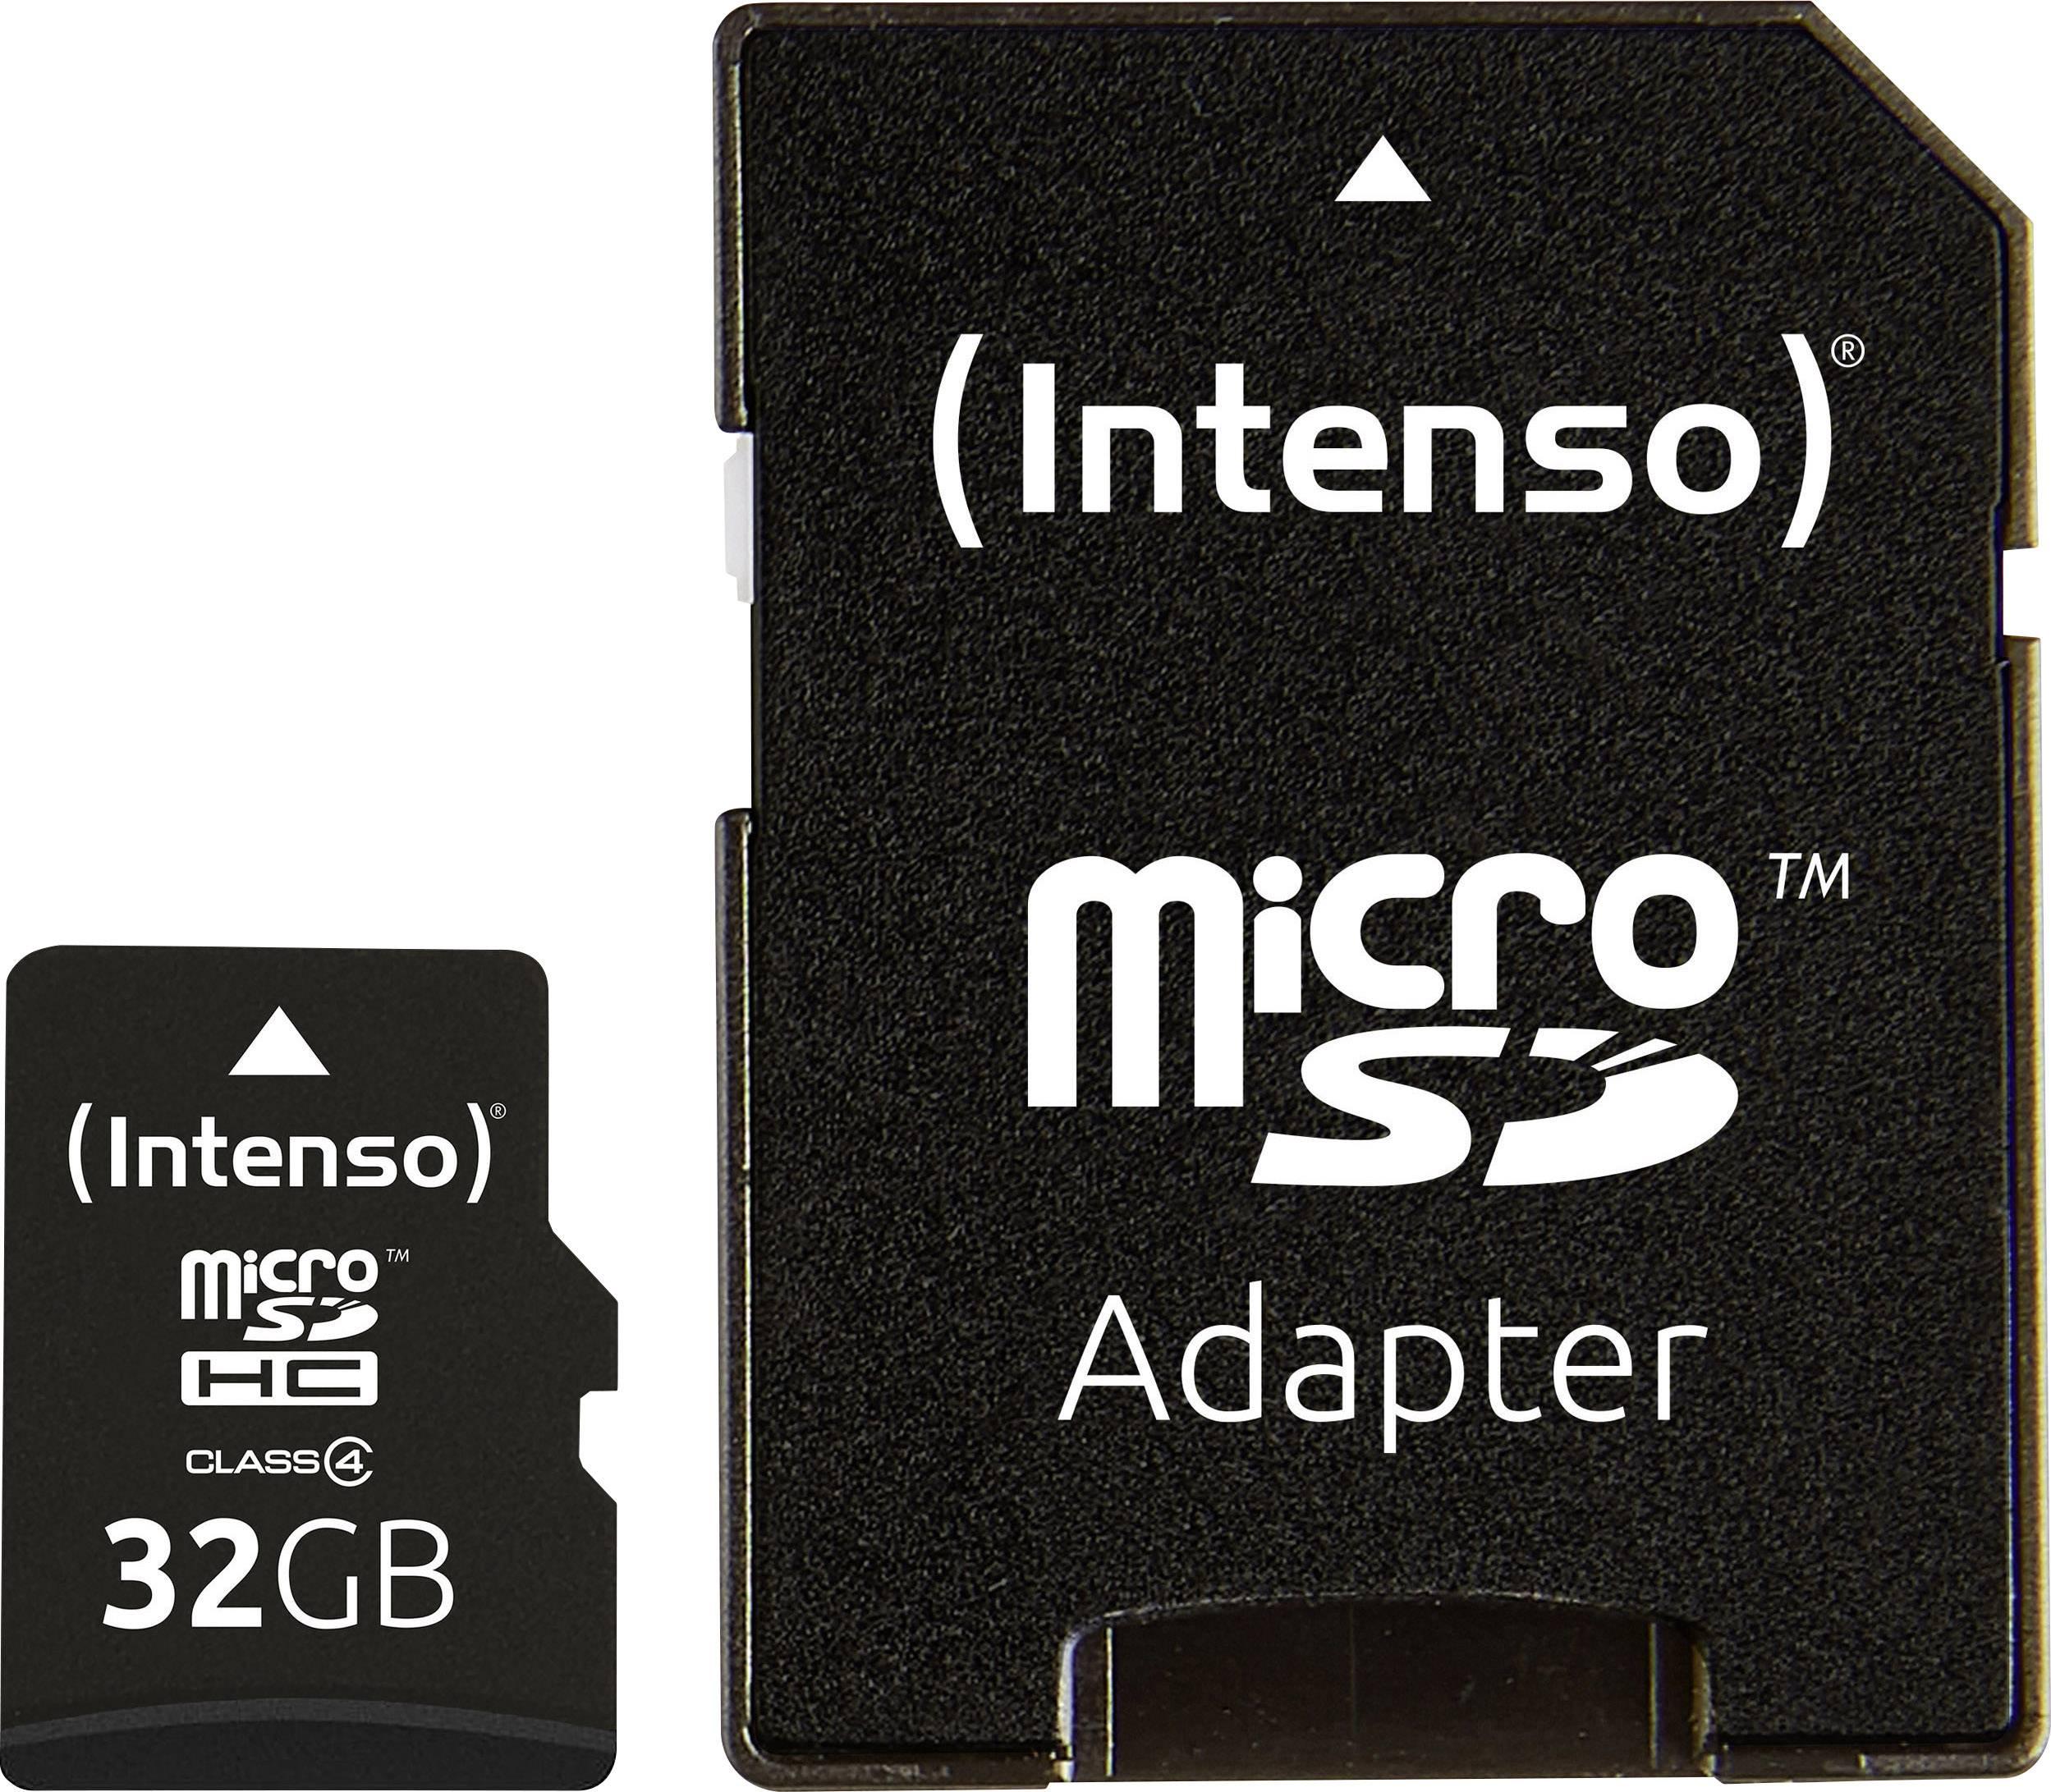 Pamäťová karta micro SDHC, 32 GB, Intenso 32 GB Micro SDHC-Card, Class 4, vr. SD adaptéru